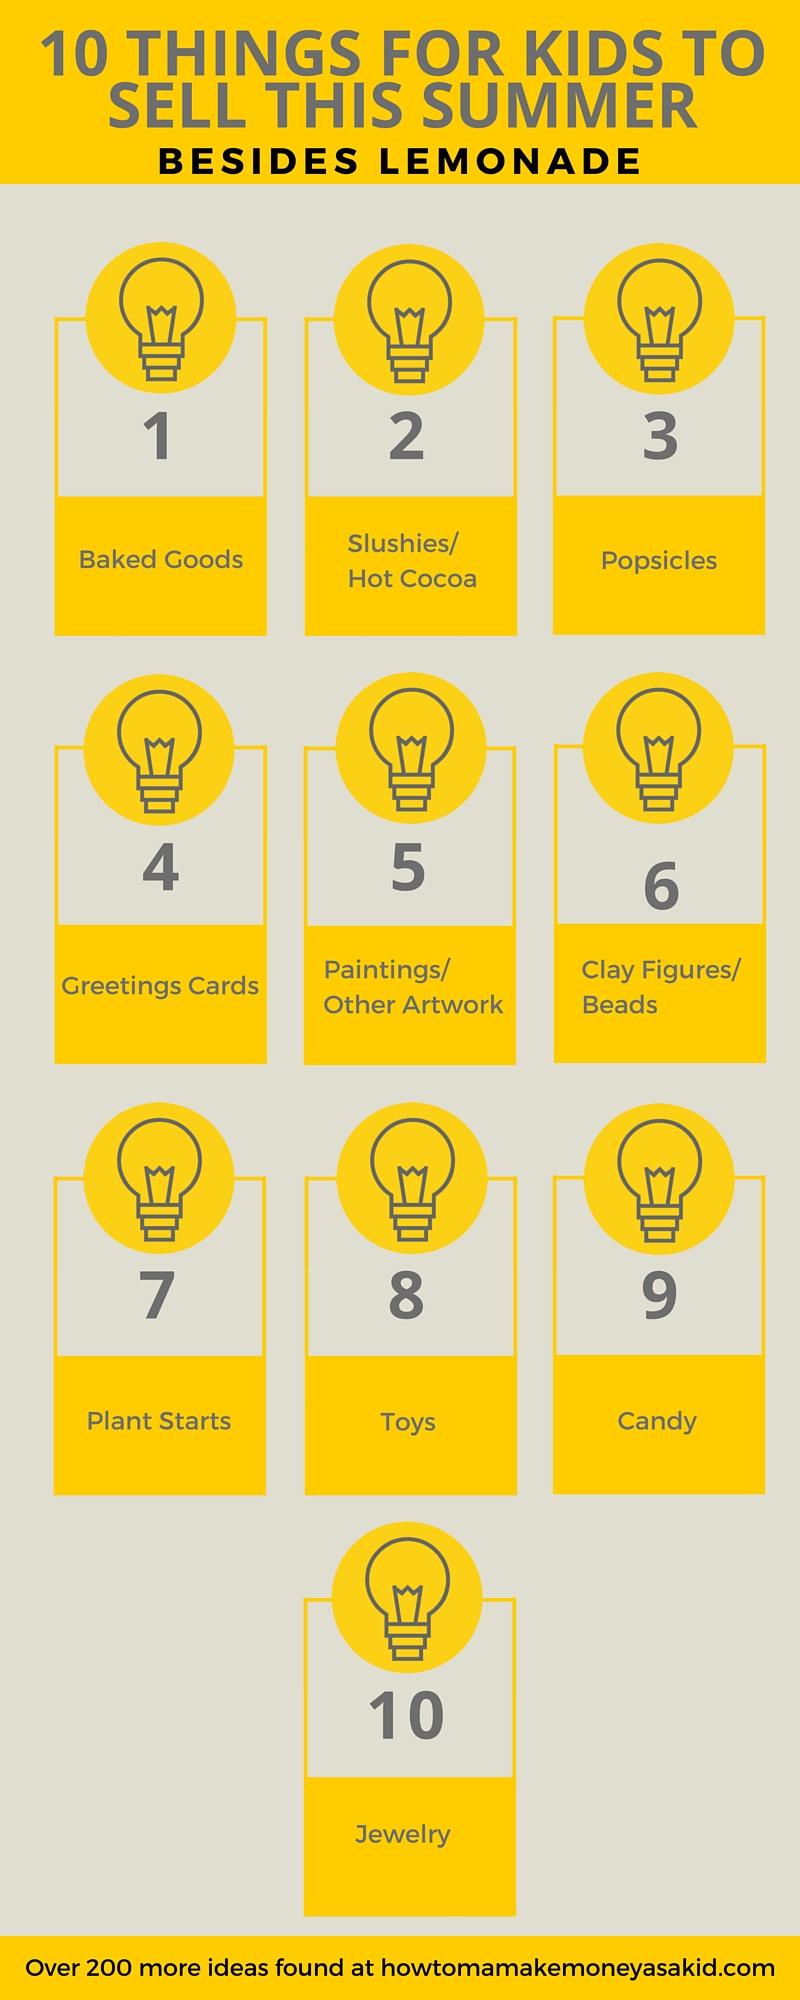 10 Things To Sell Besides Lemonade - HOWTOMAKEMONEYASAKID COM